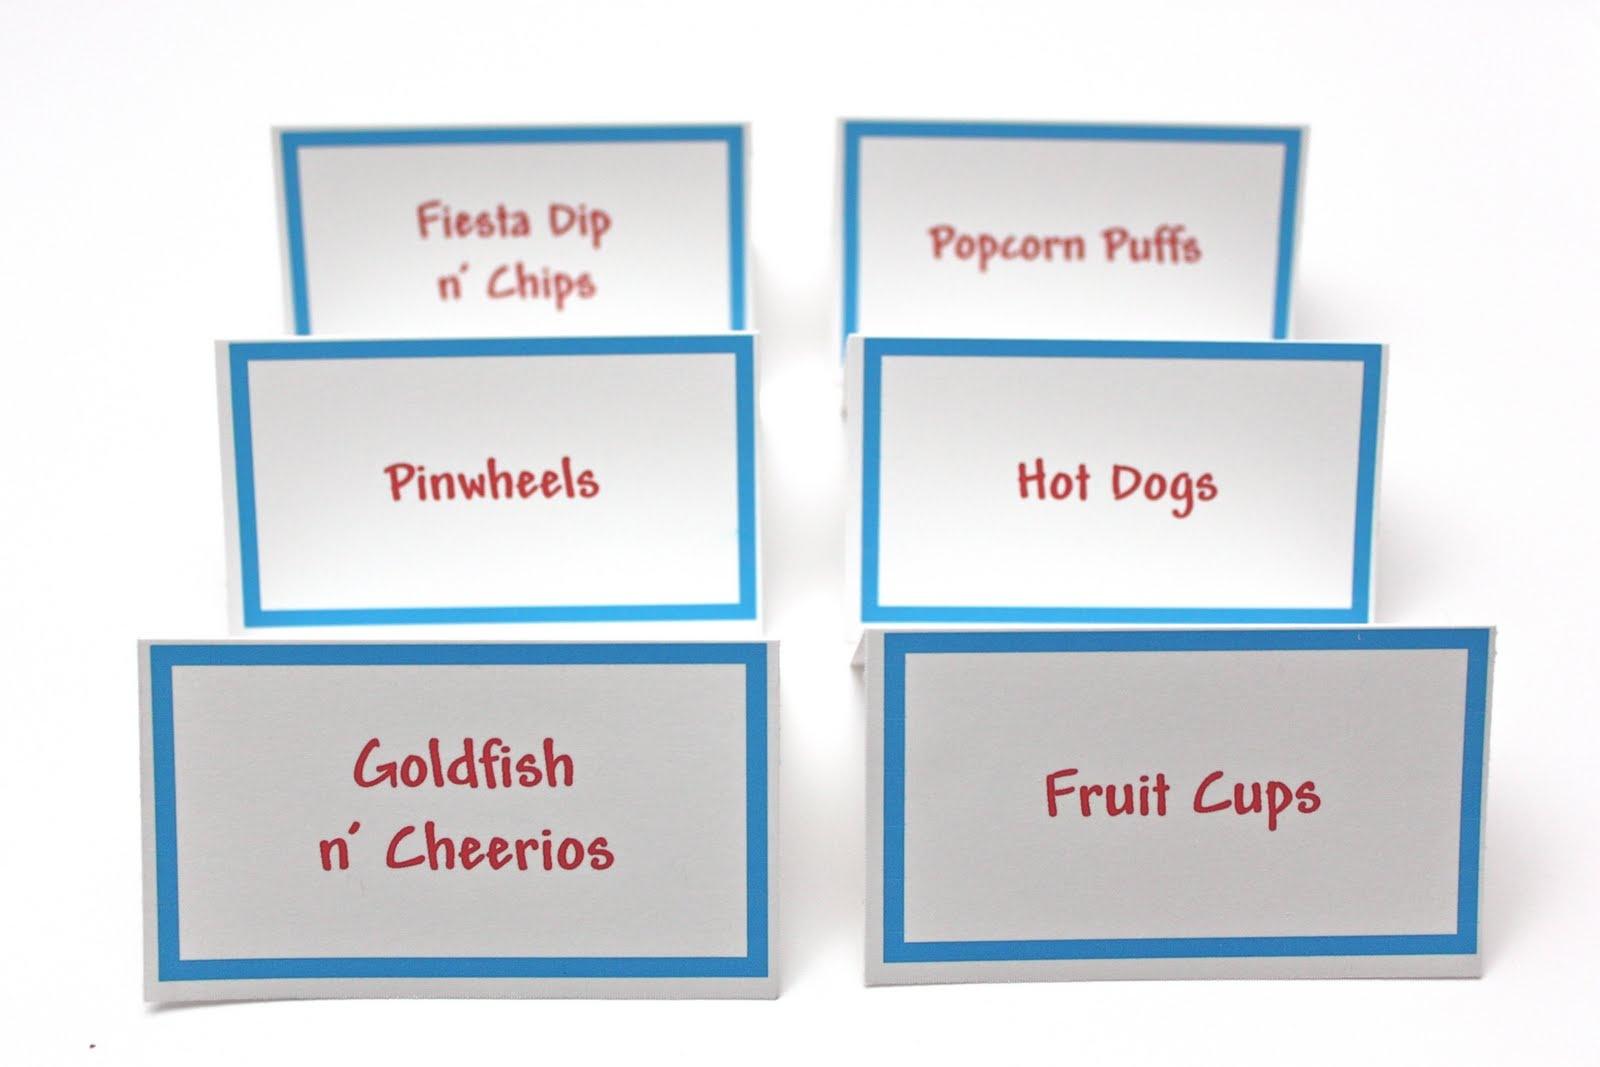 Free Printable Food Tent Cards - Printable Cards - Free Printable Food Tent Cards